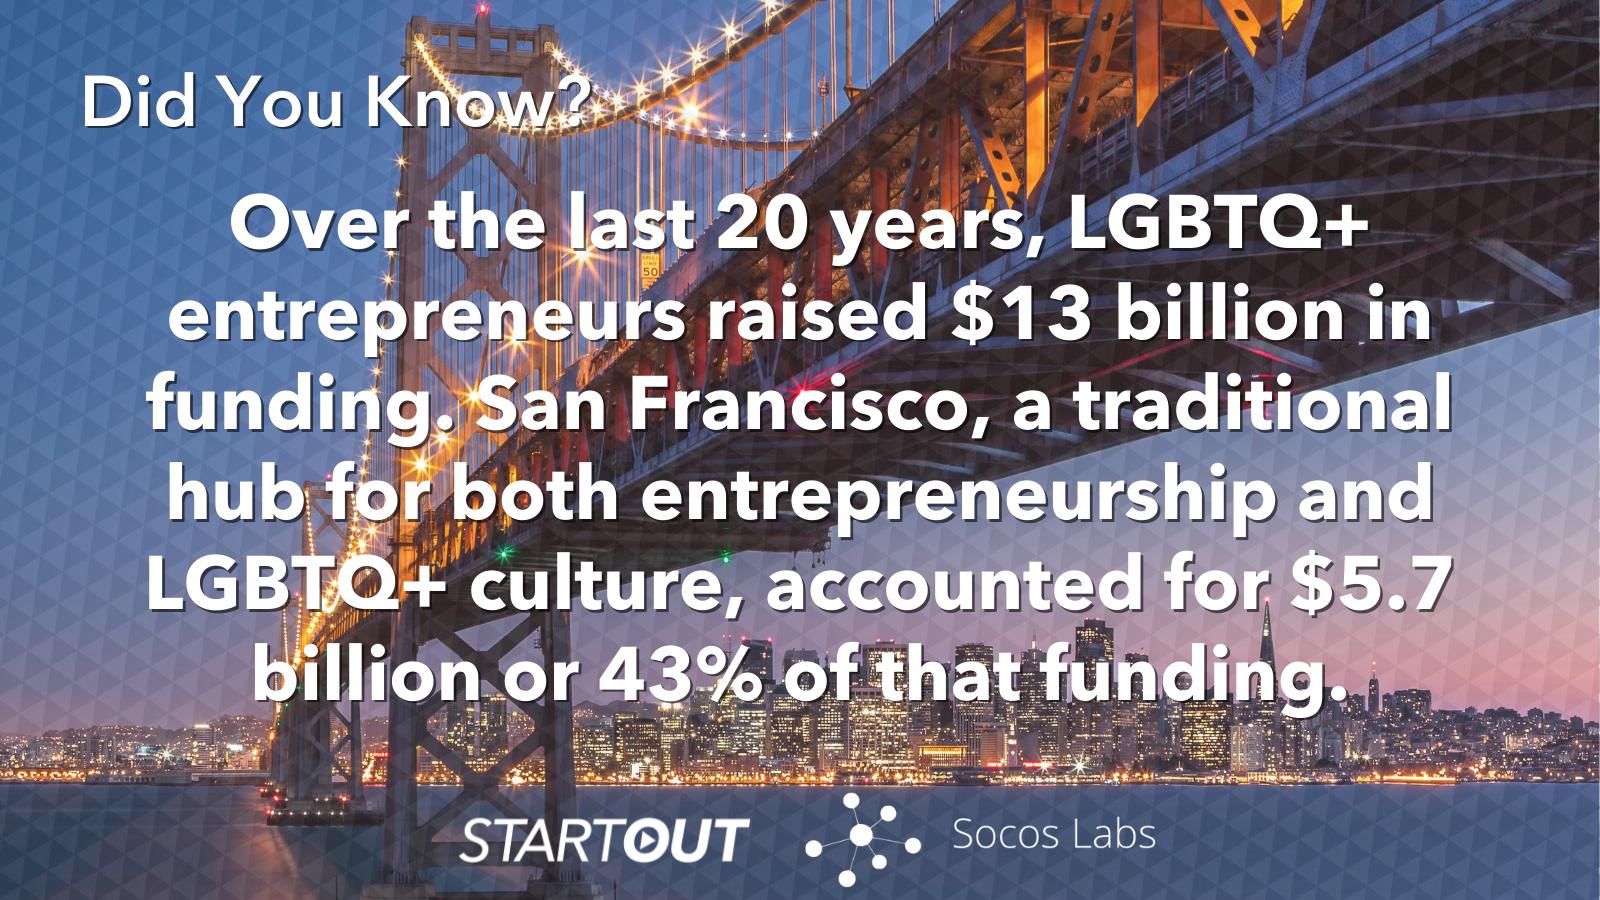 Startout LGBTQ+ entrepreneurs fact sheet